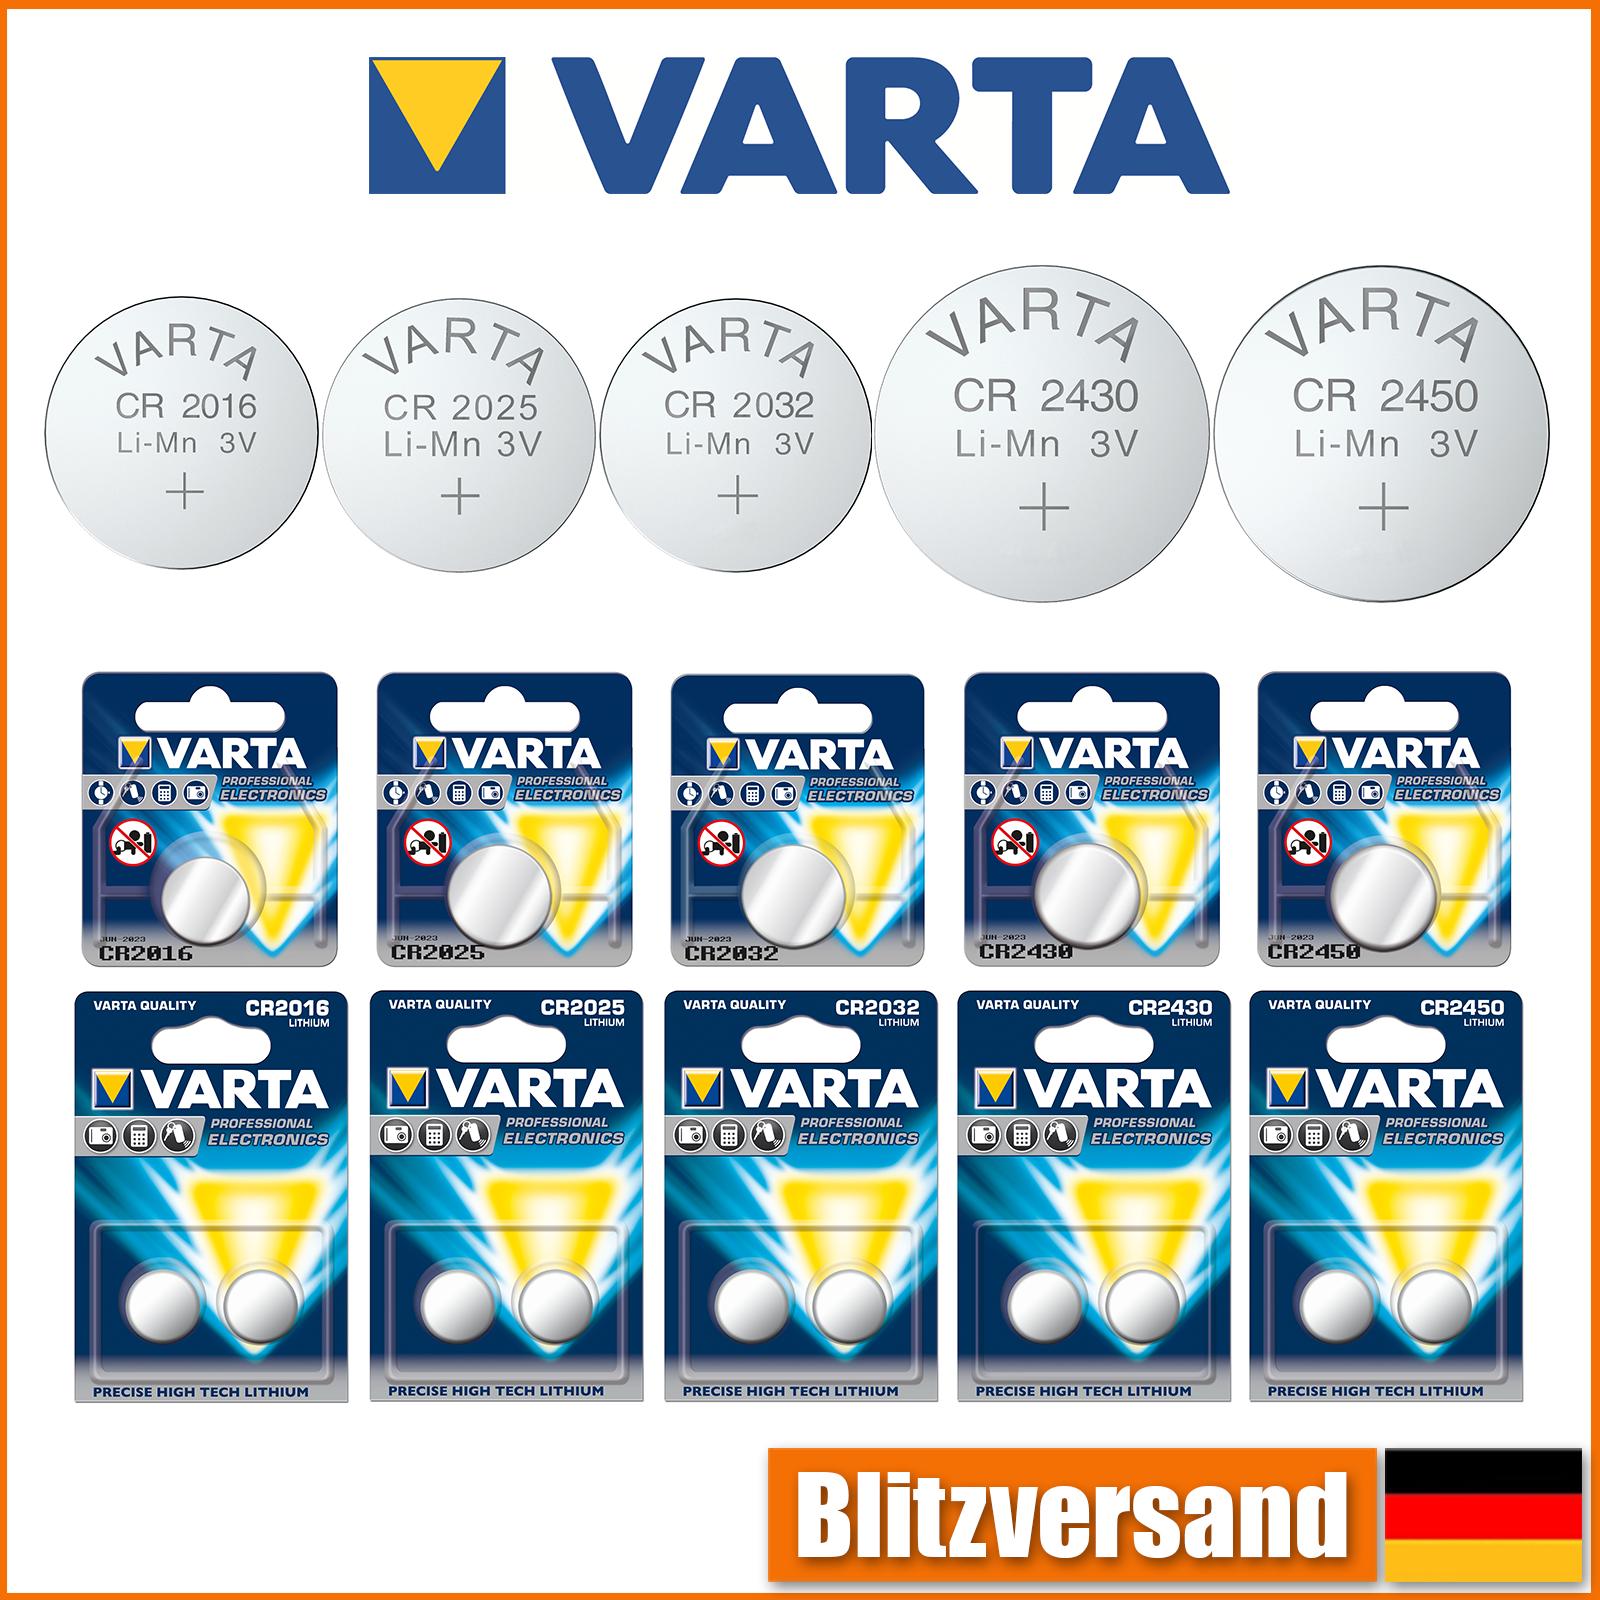 Varta Original Knopfzelle Knopfbatterie CR 2016 2025 2032 2430 2450 3V Lithium